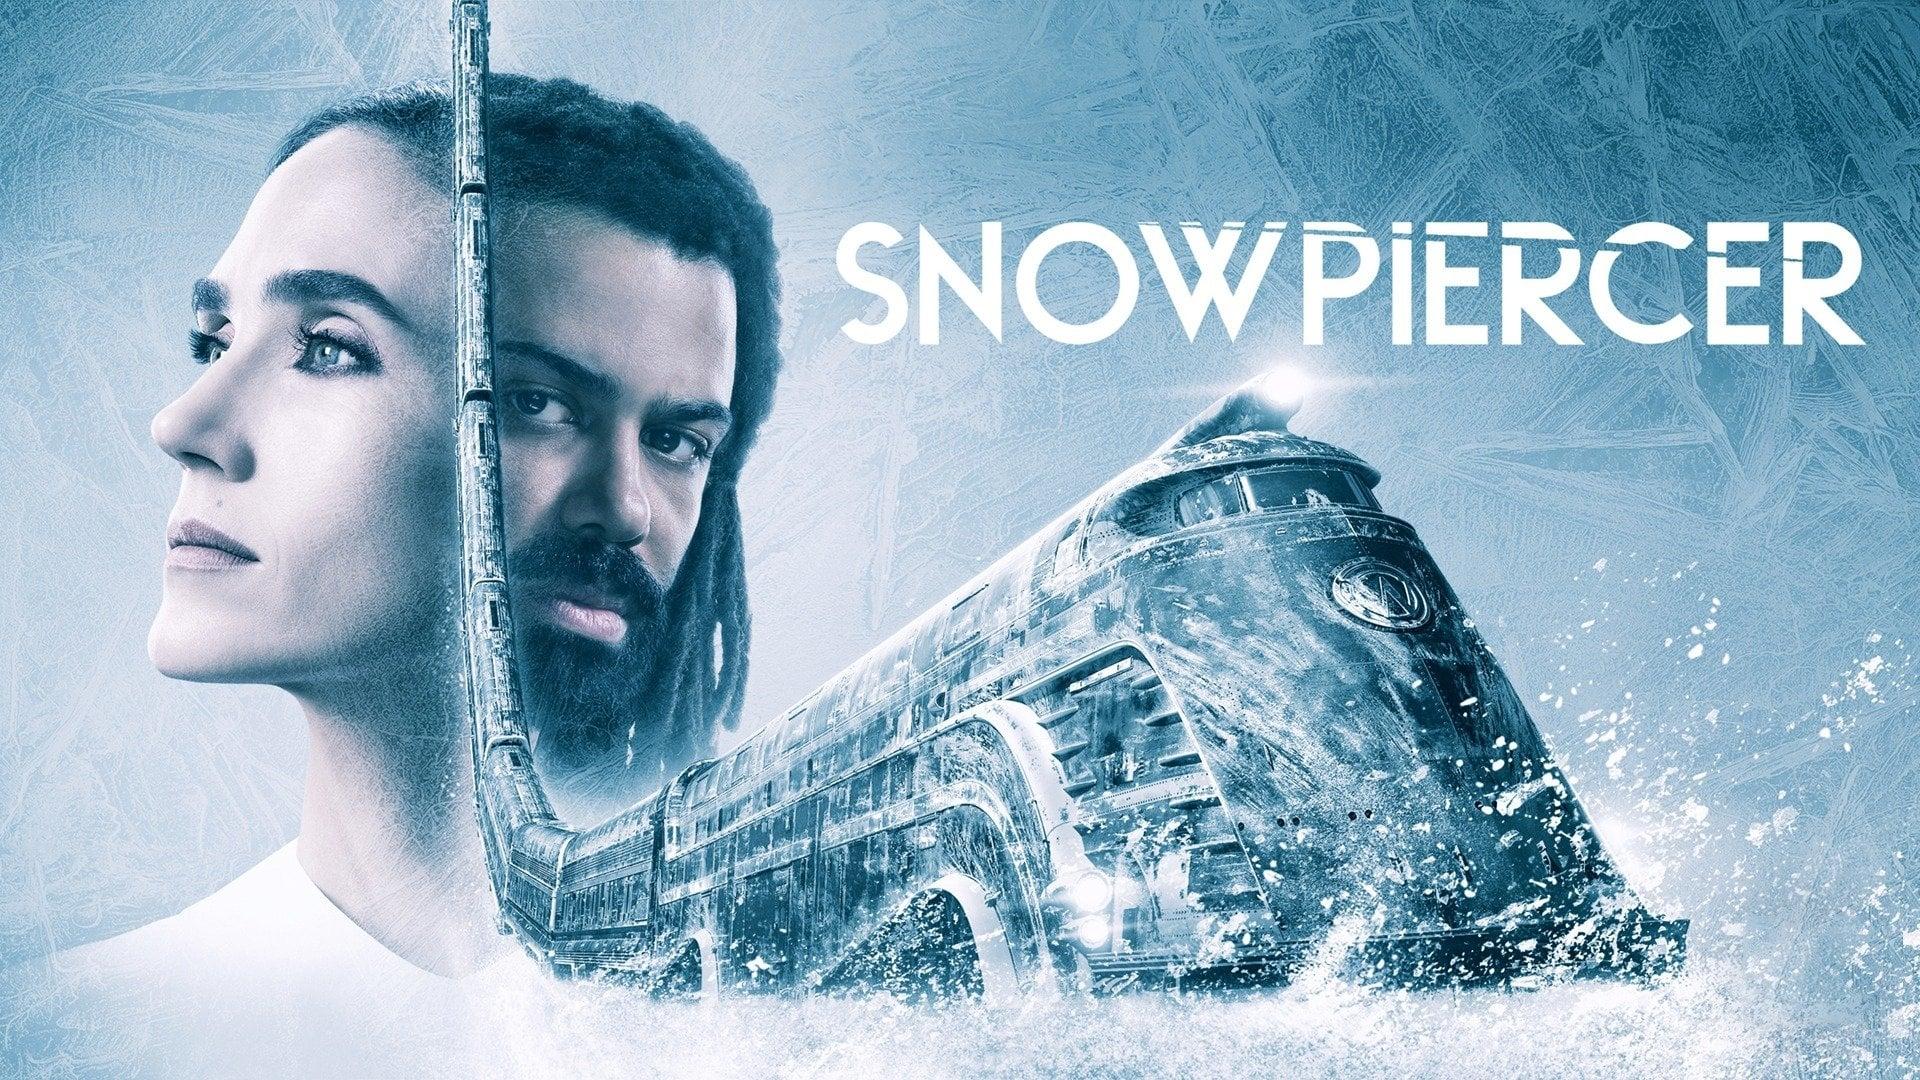 720p~ Snowpiercer Season 2 Episode 4